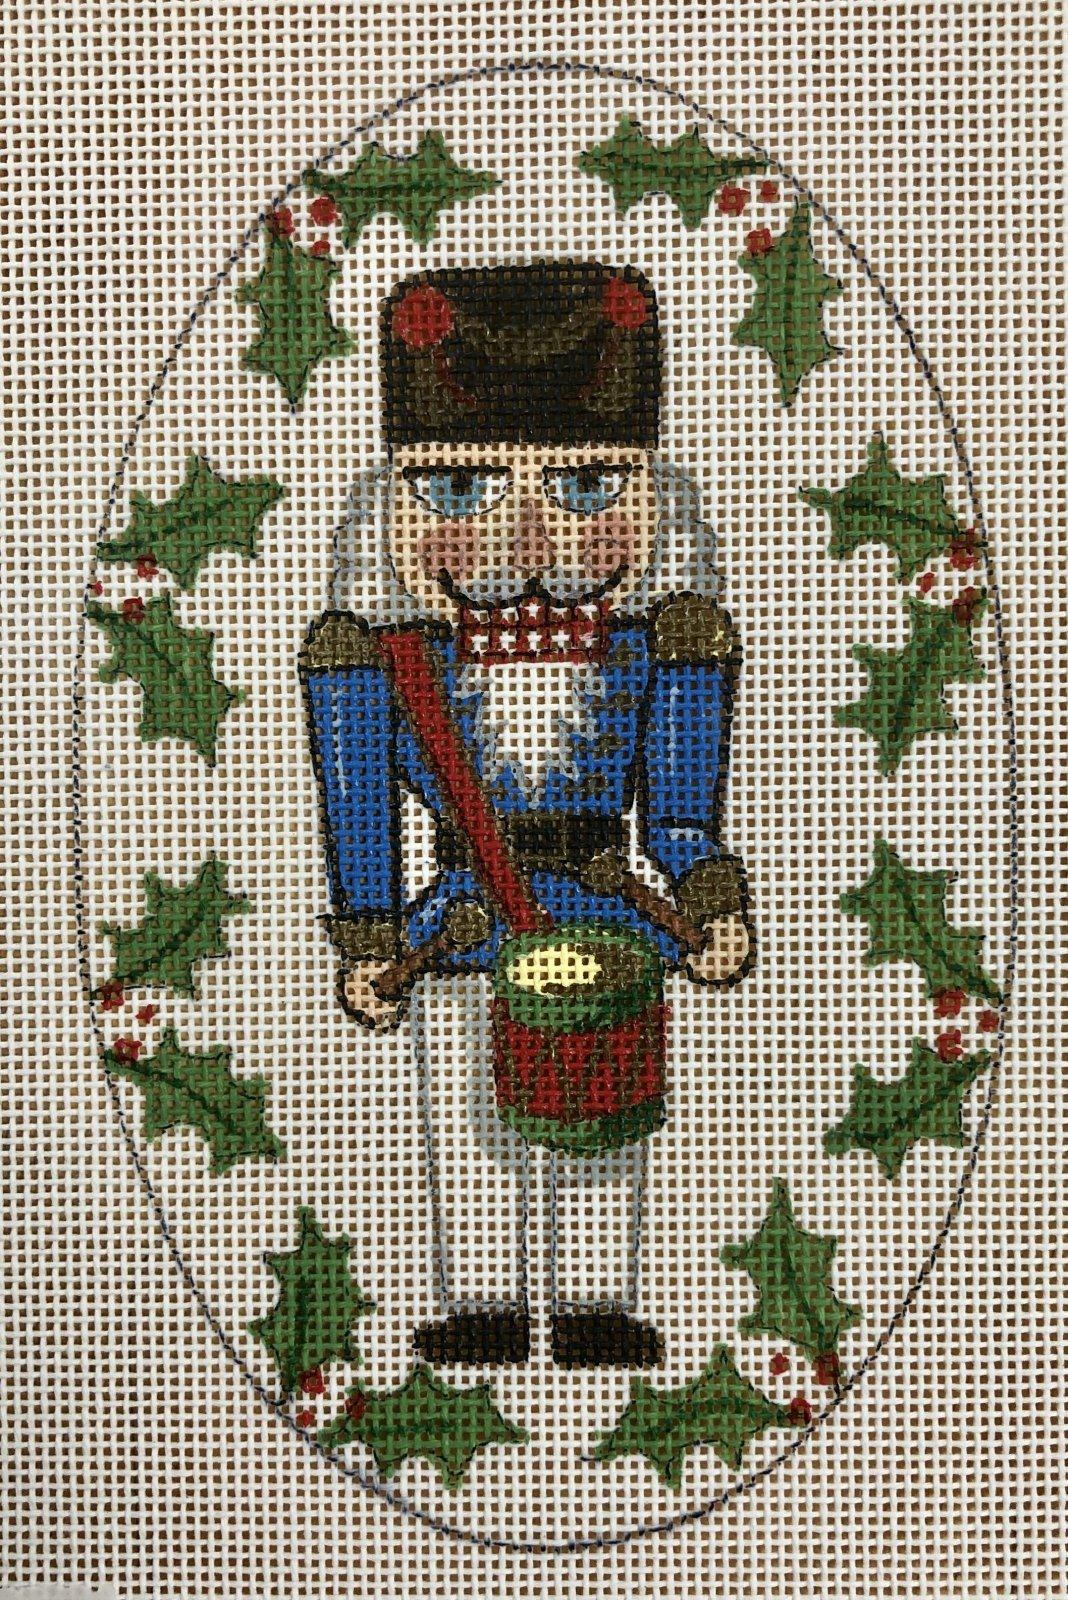 nutcracker ornament, blue & red